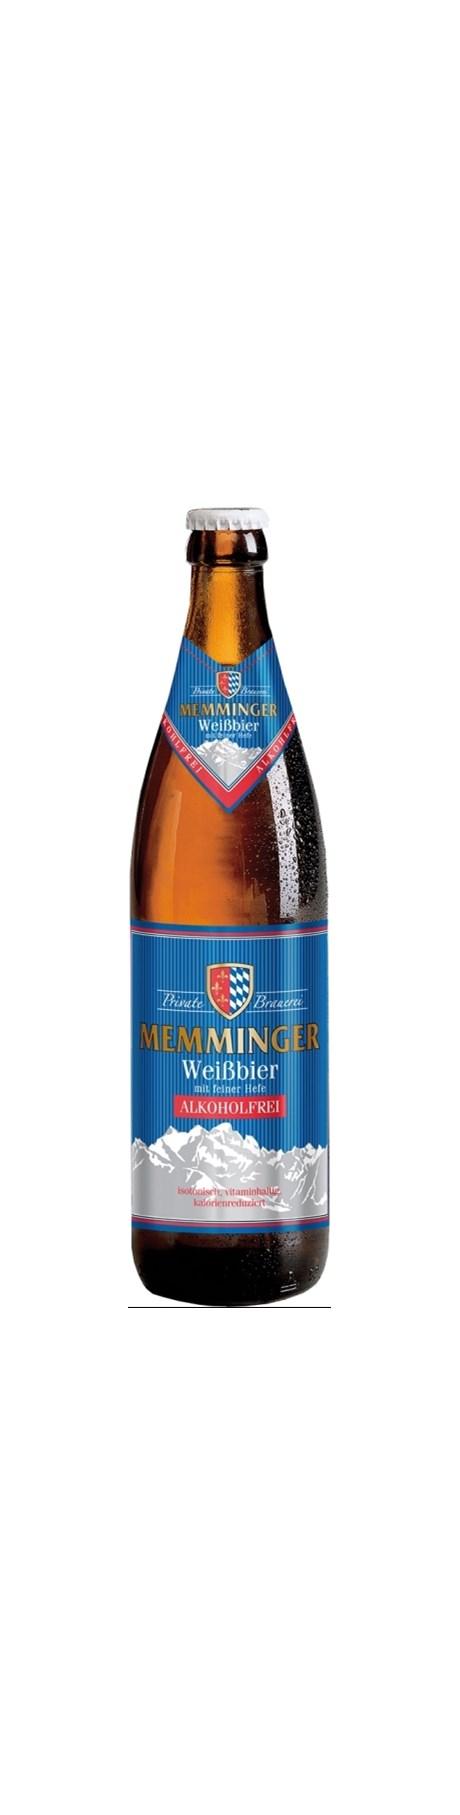 Memminger Weissbier Alkoholfrei